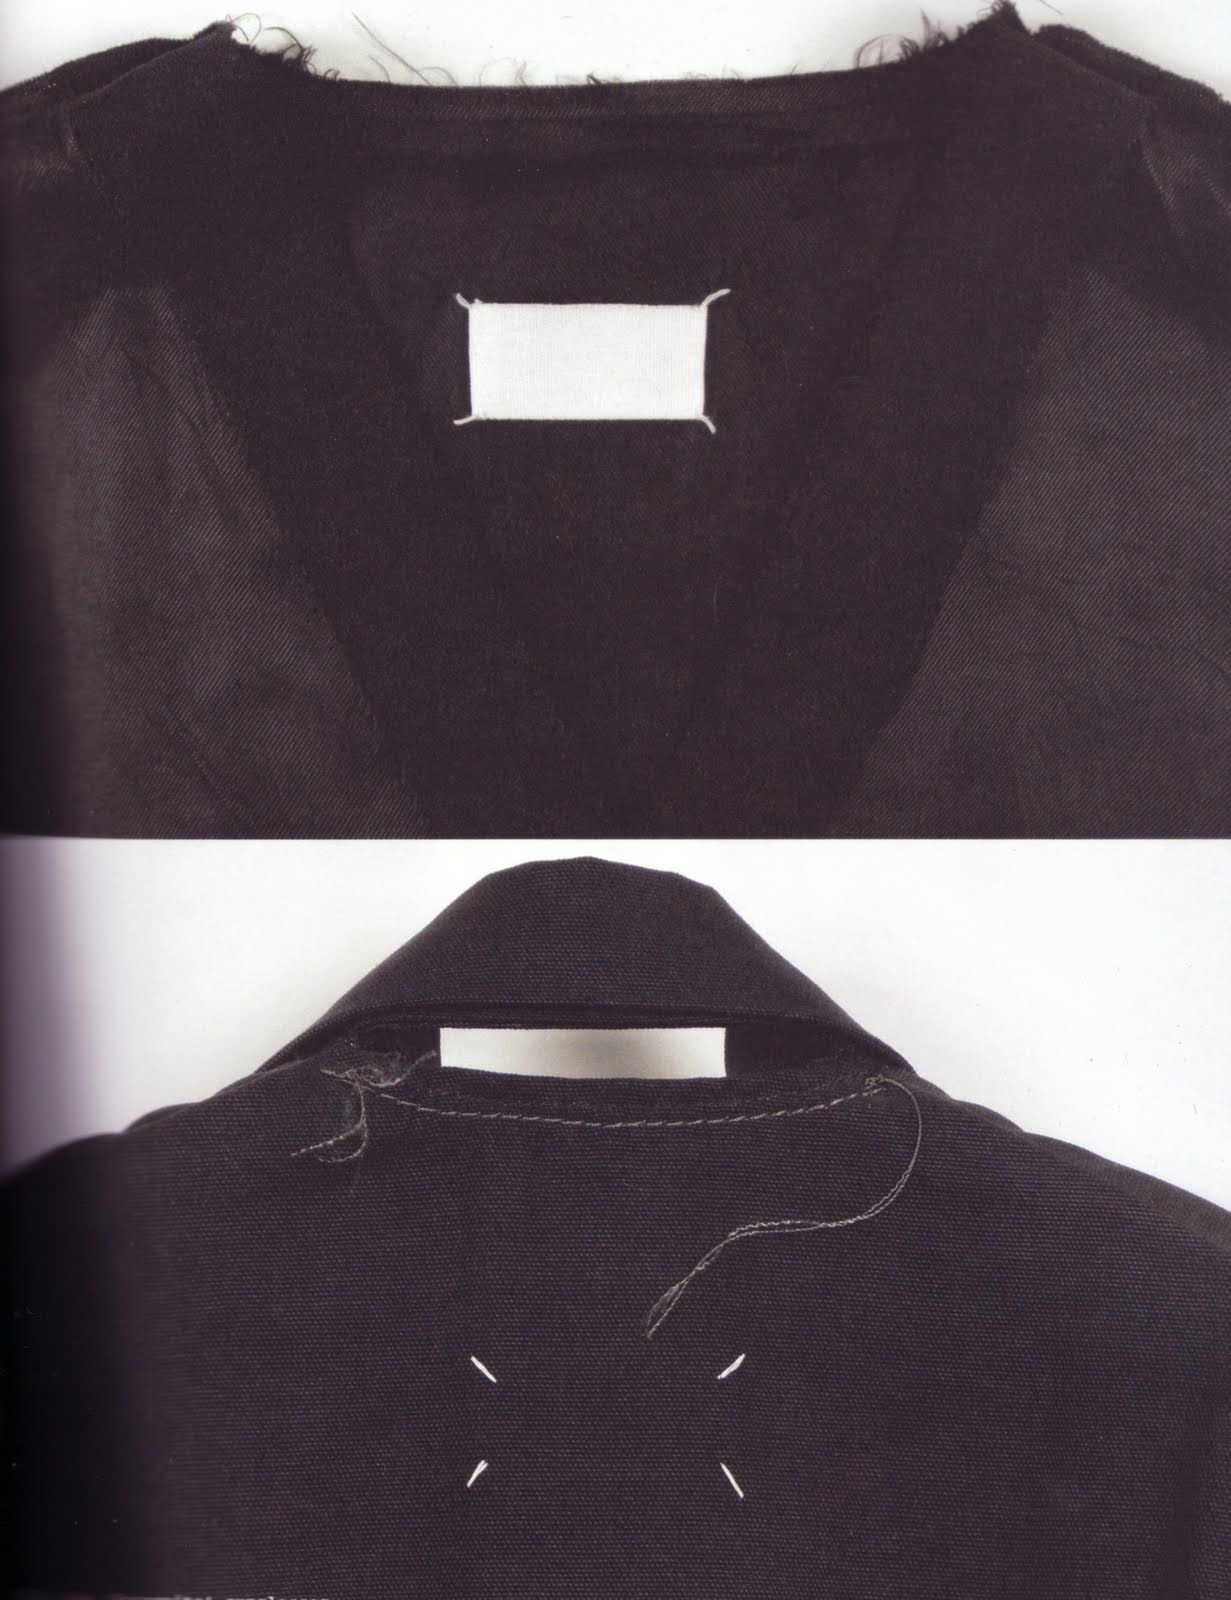 2a26dc6d27f Original plain blank Maison Martin Margiela label